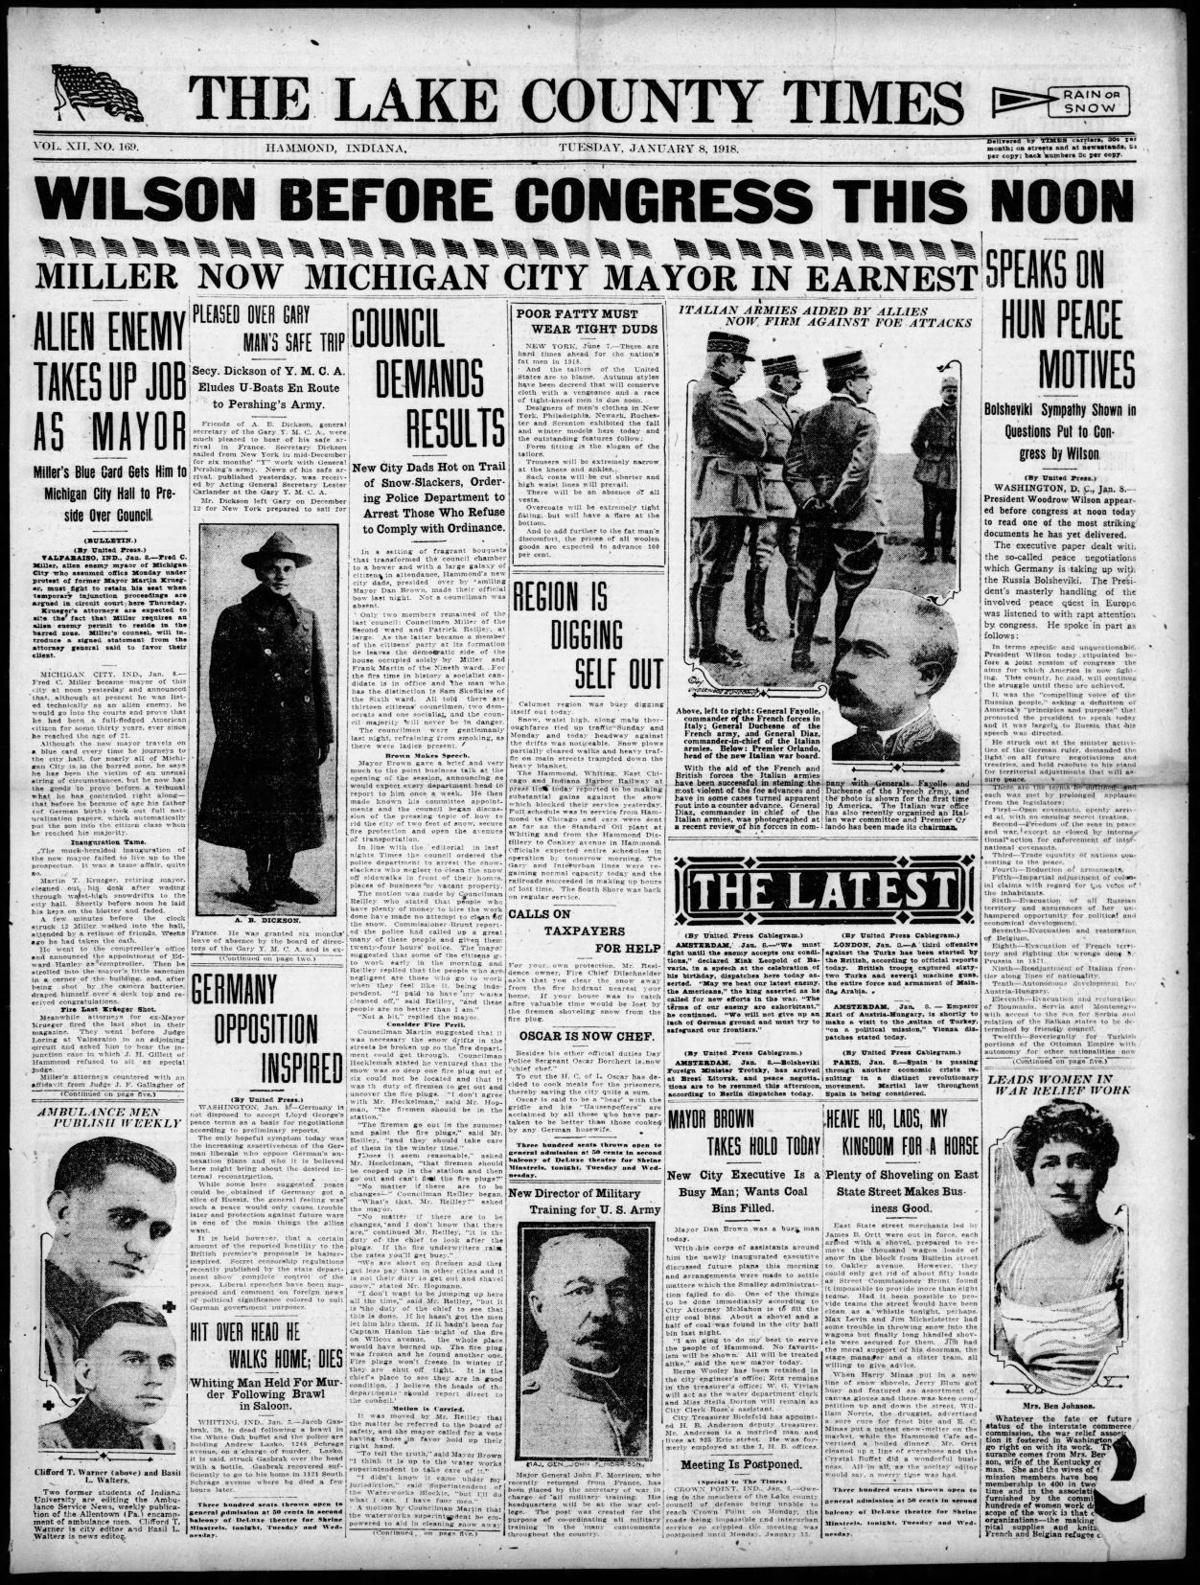 Jan. 8, 1918: Alien Enemy Takes Up Job As Mayor